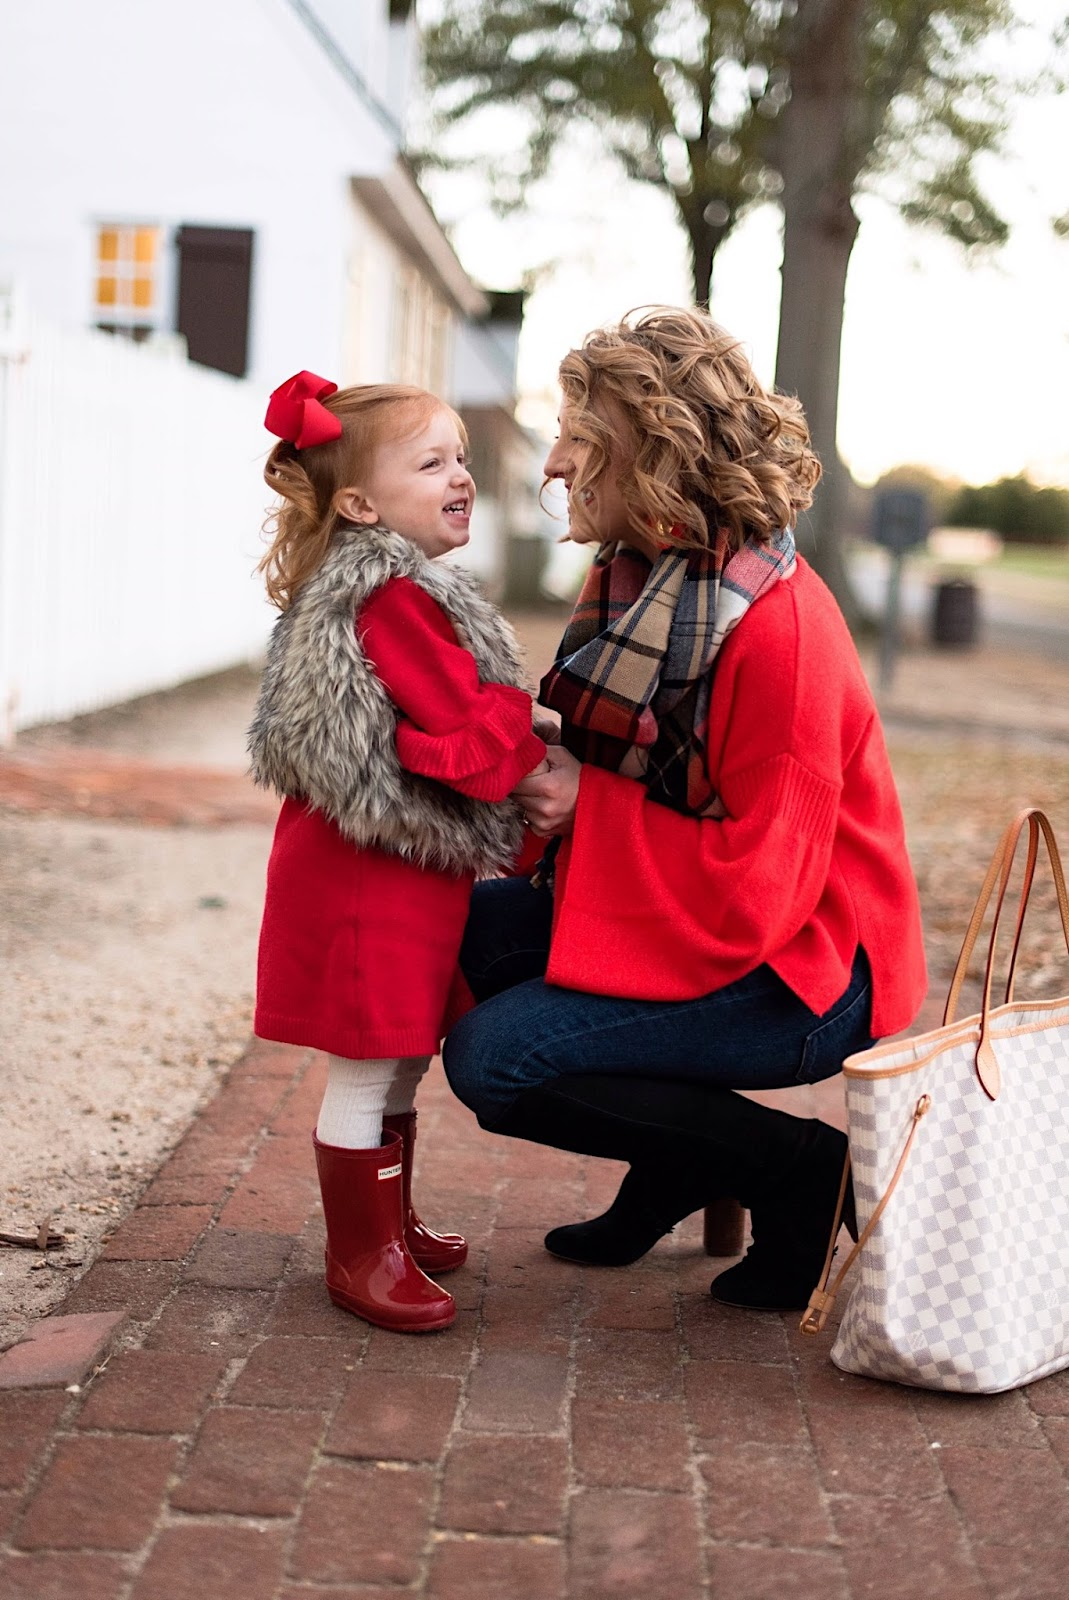 Mommy & Me Holiday Looks - Something Delightful Blog